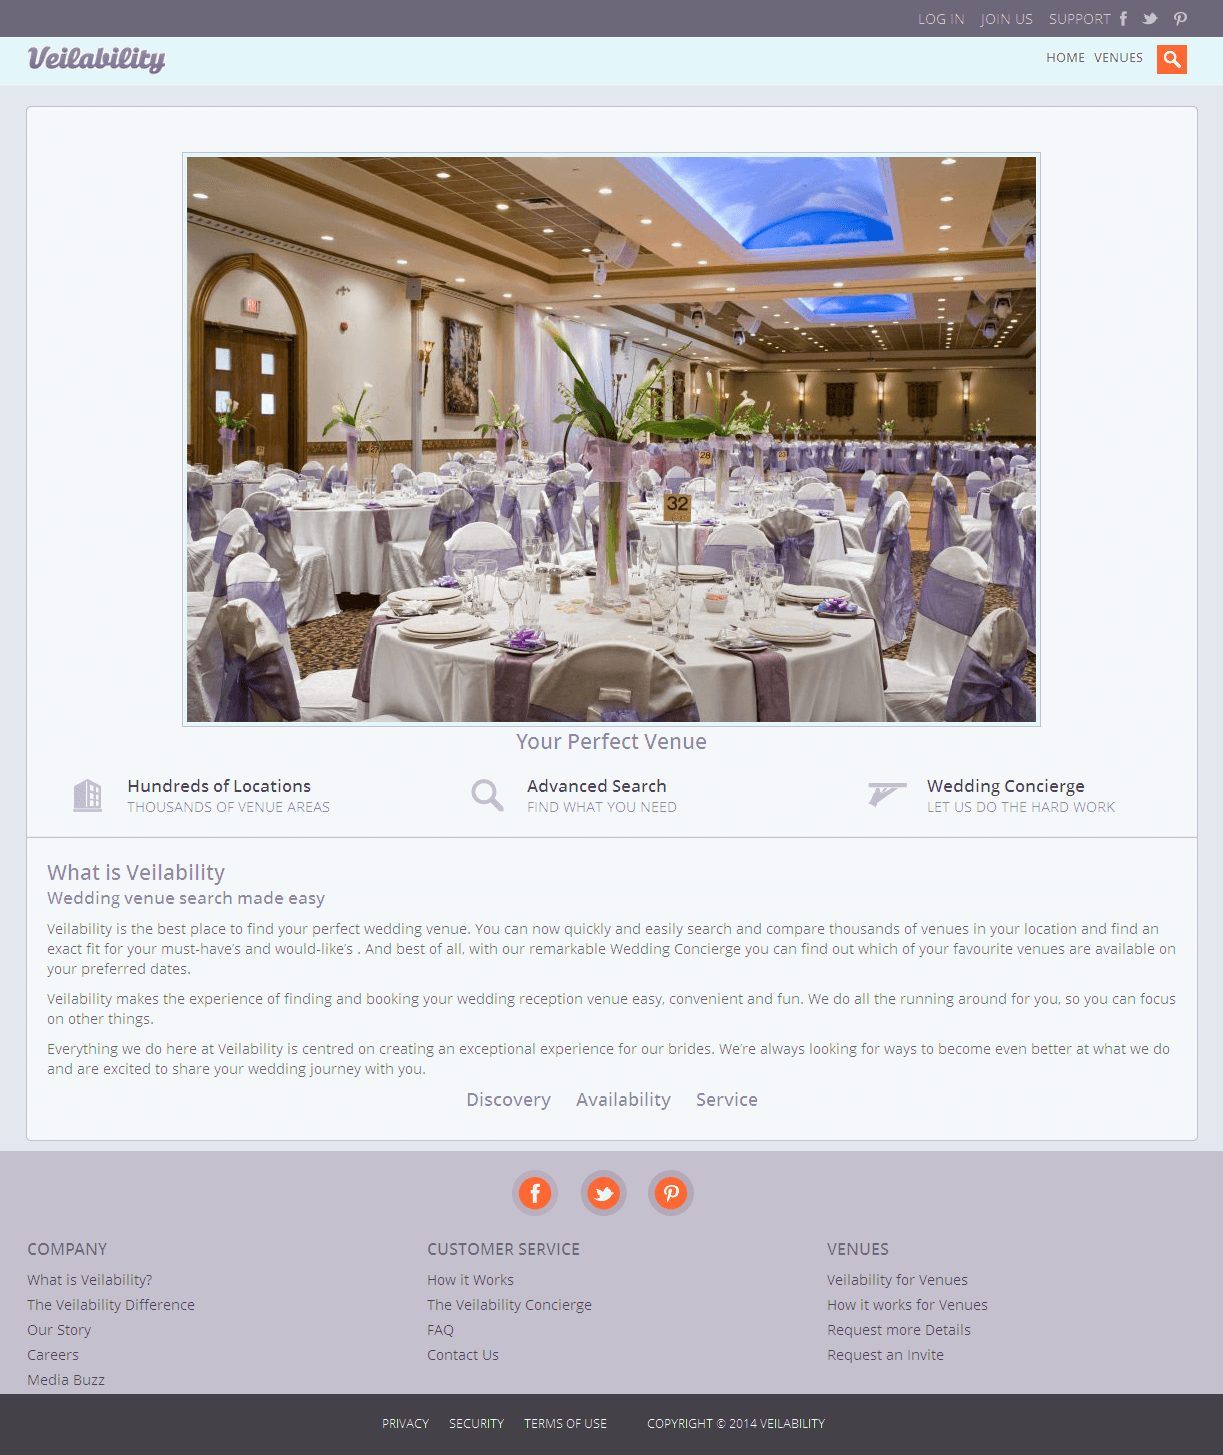 Design & Development of A Wedding Venue Search Site